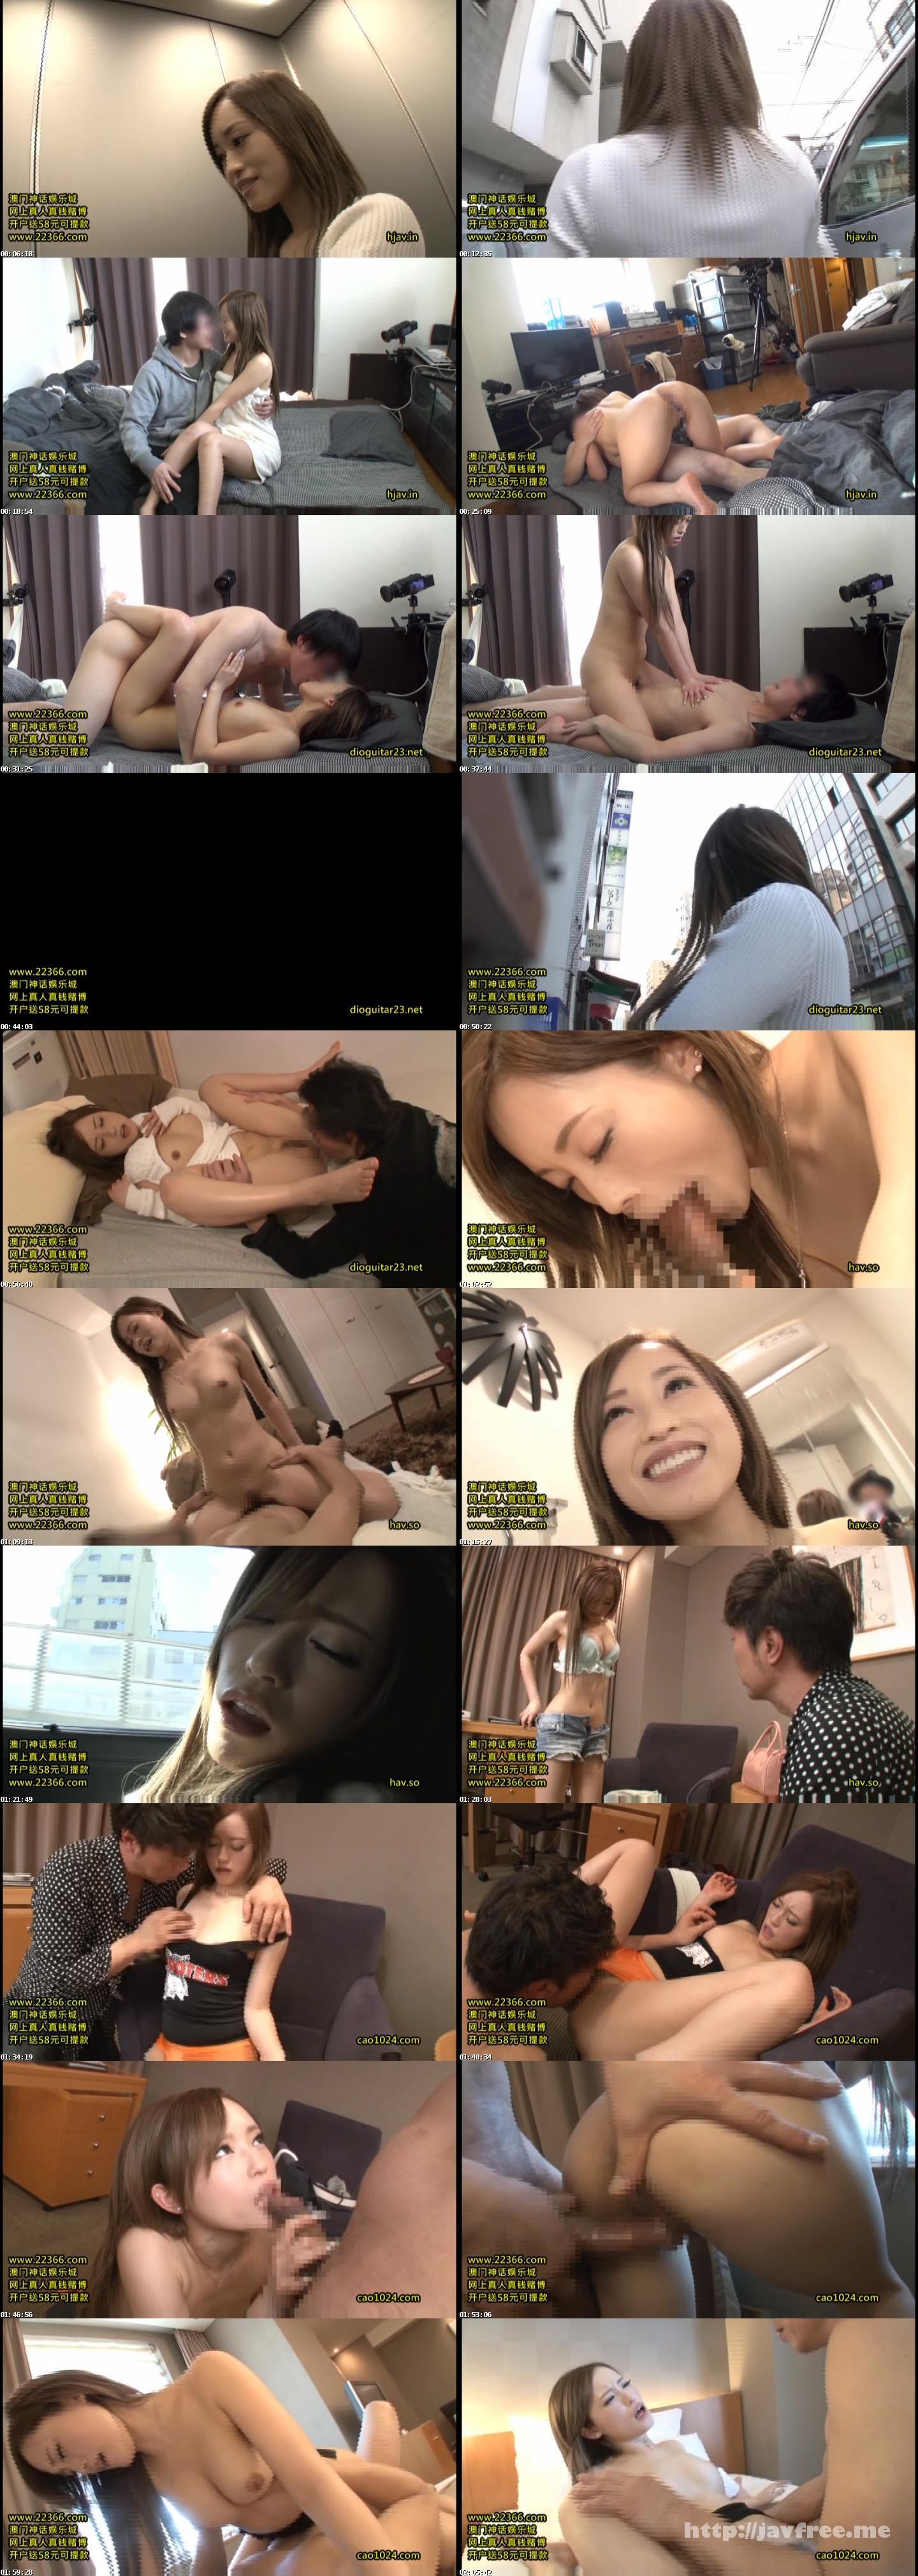 [CHN-070] 新・絶対的美少女、お貸しします。 ACT.38 桐嶋りの - image CHN-070 on https://javfree.me